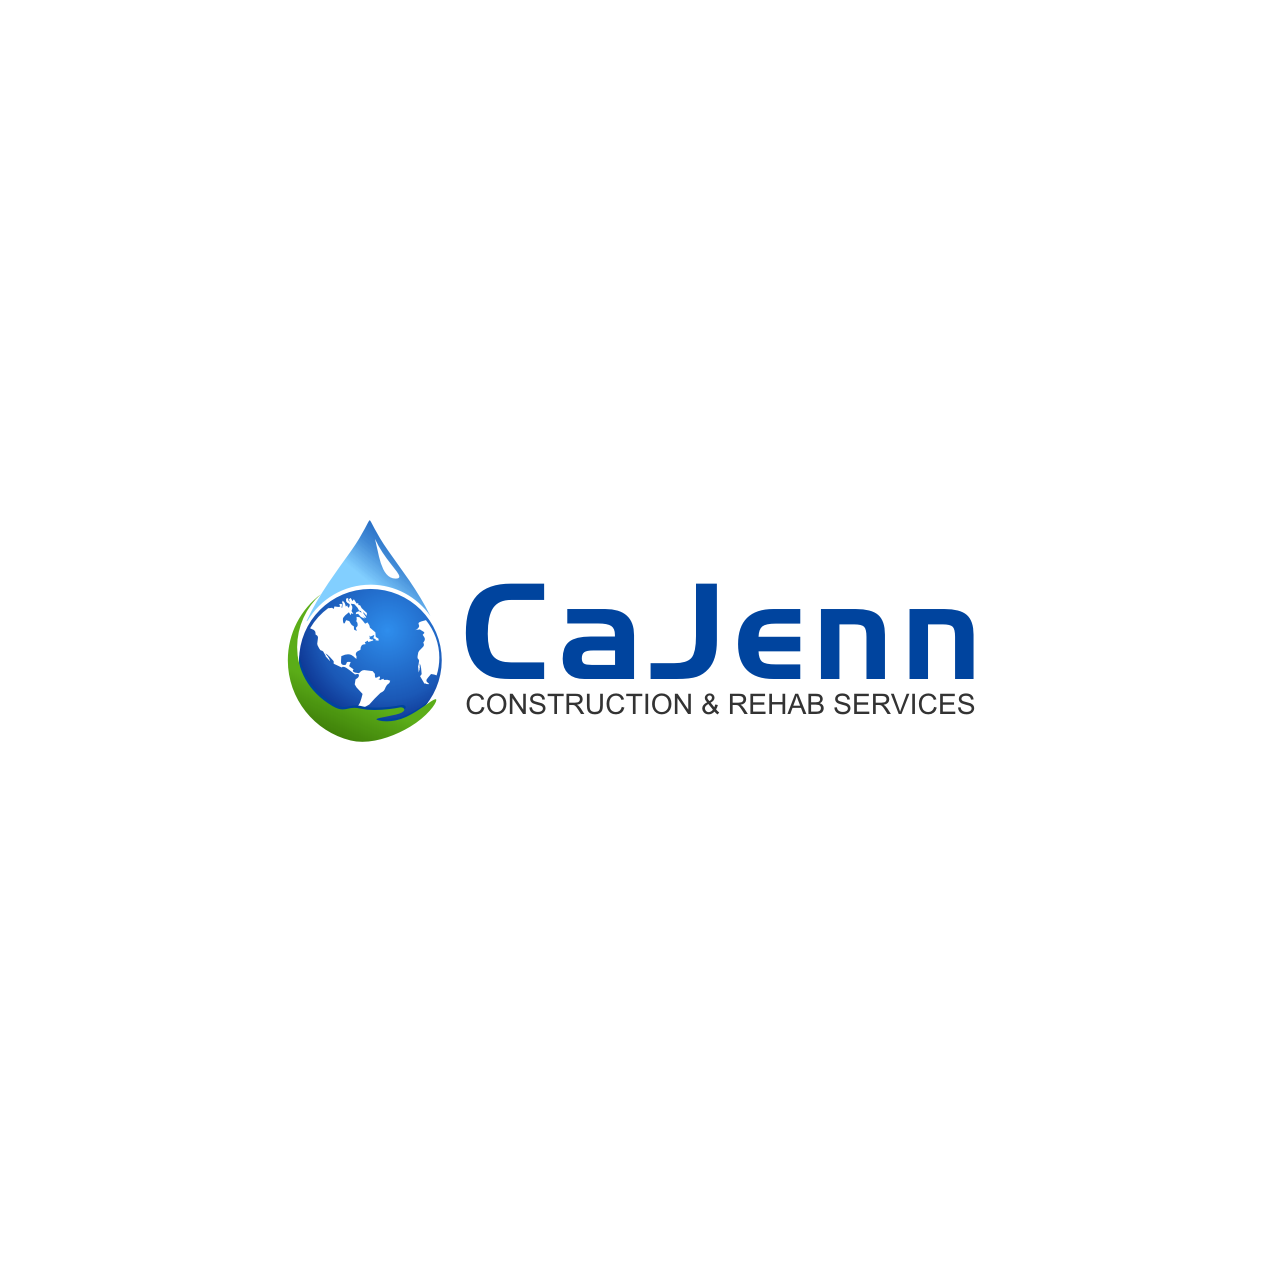 Logo Design by rifatz - Entry No. 13 in the Logo Design Contest New Logo Design for CaJenn Construction & Rehab Services.